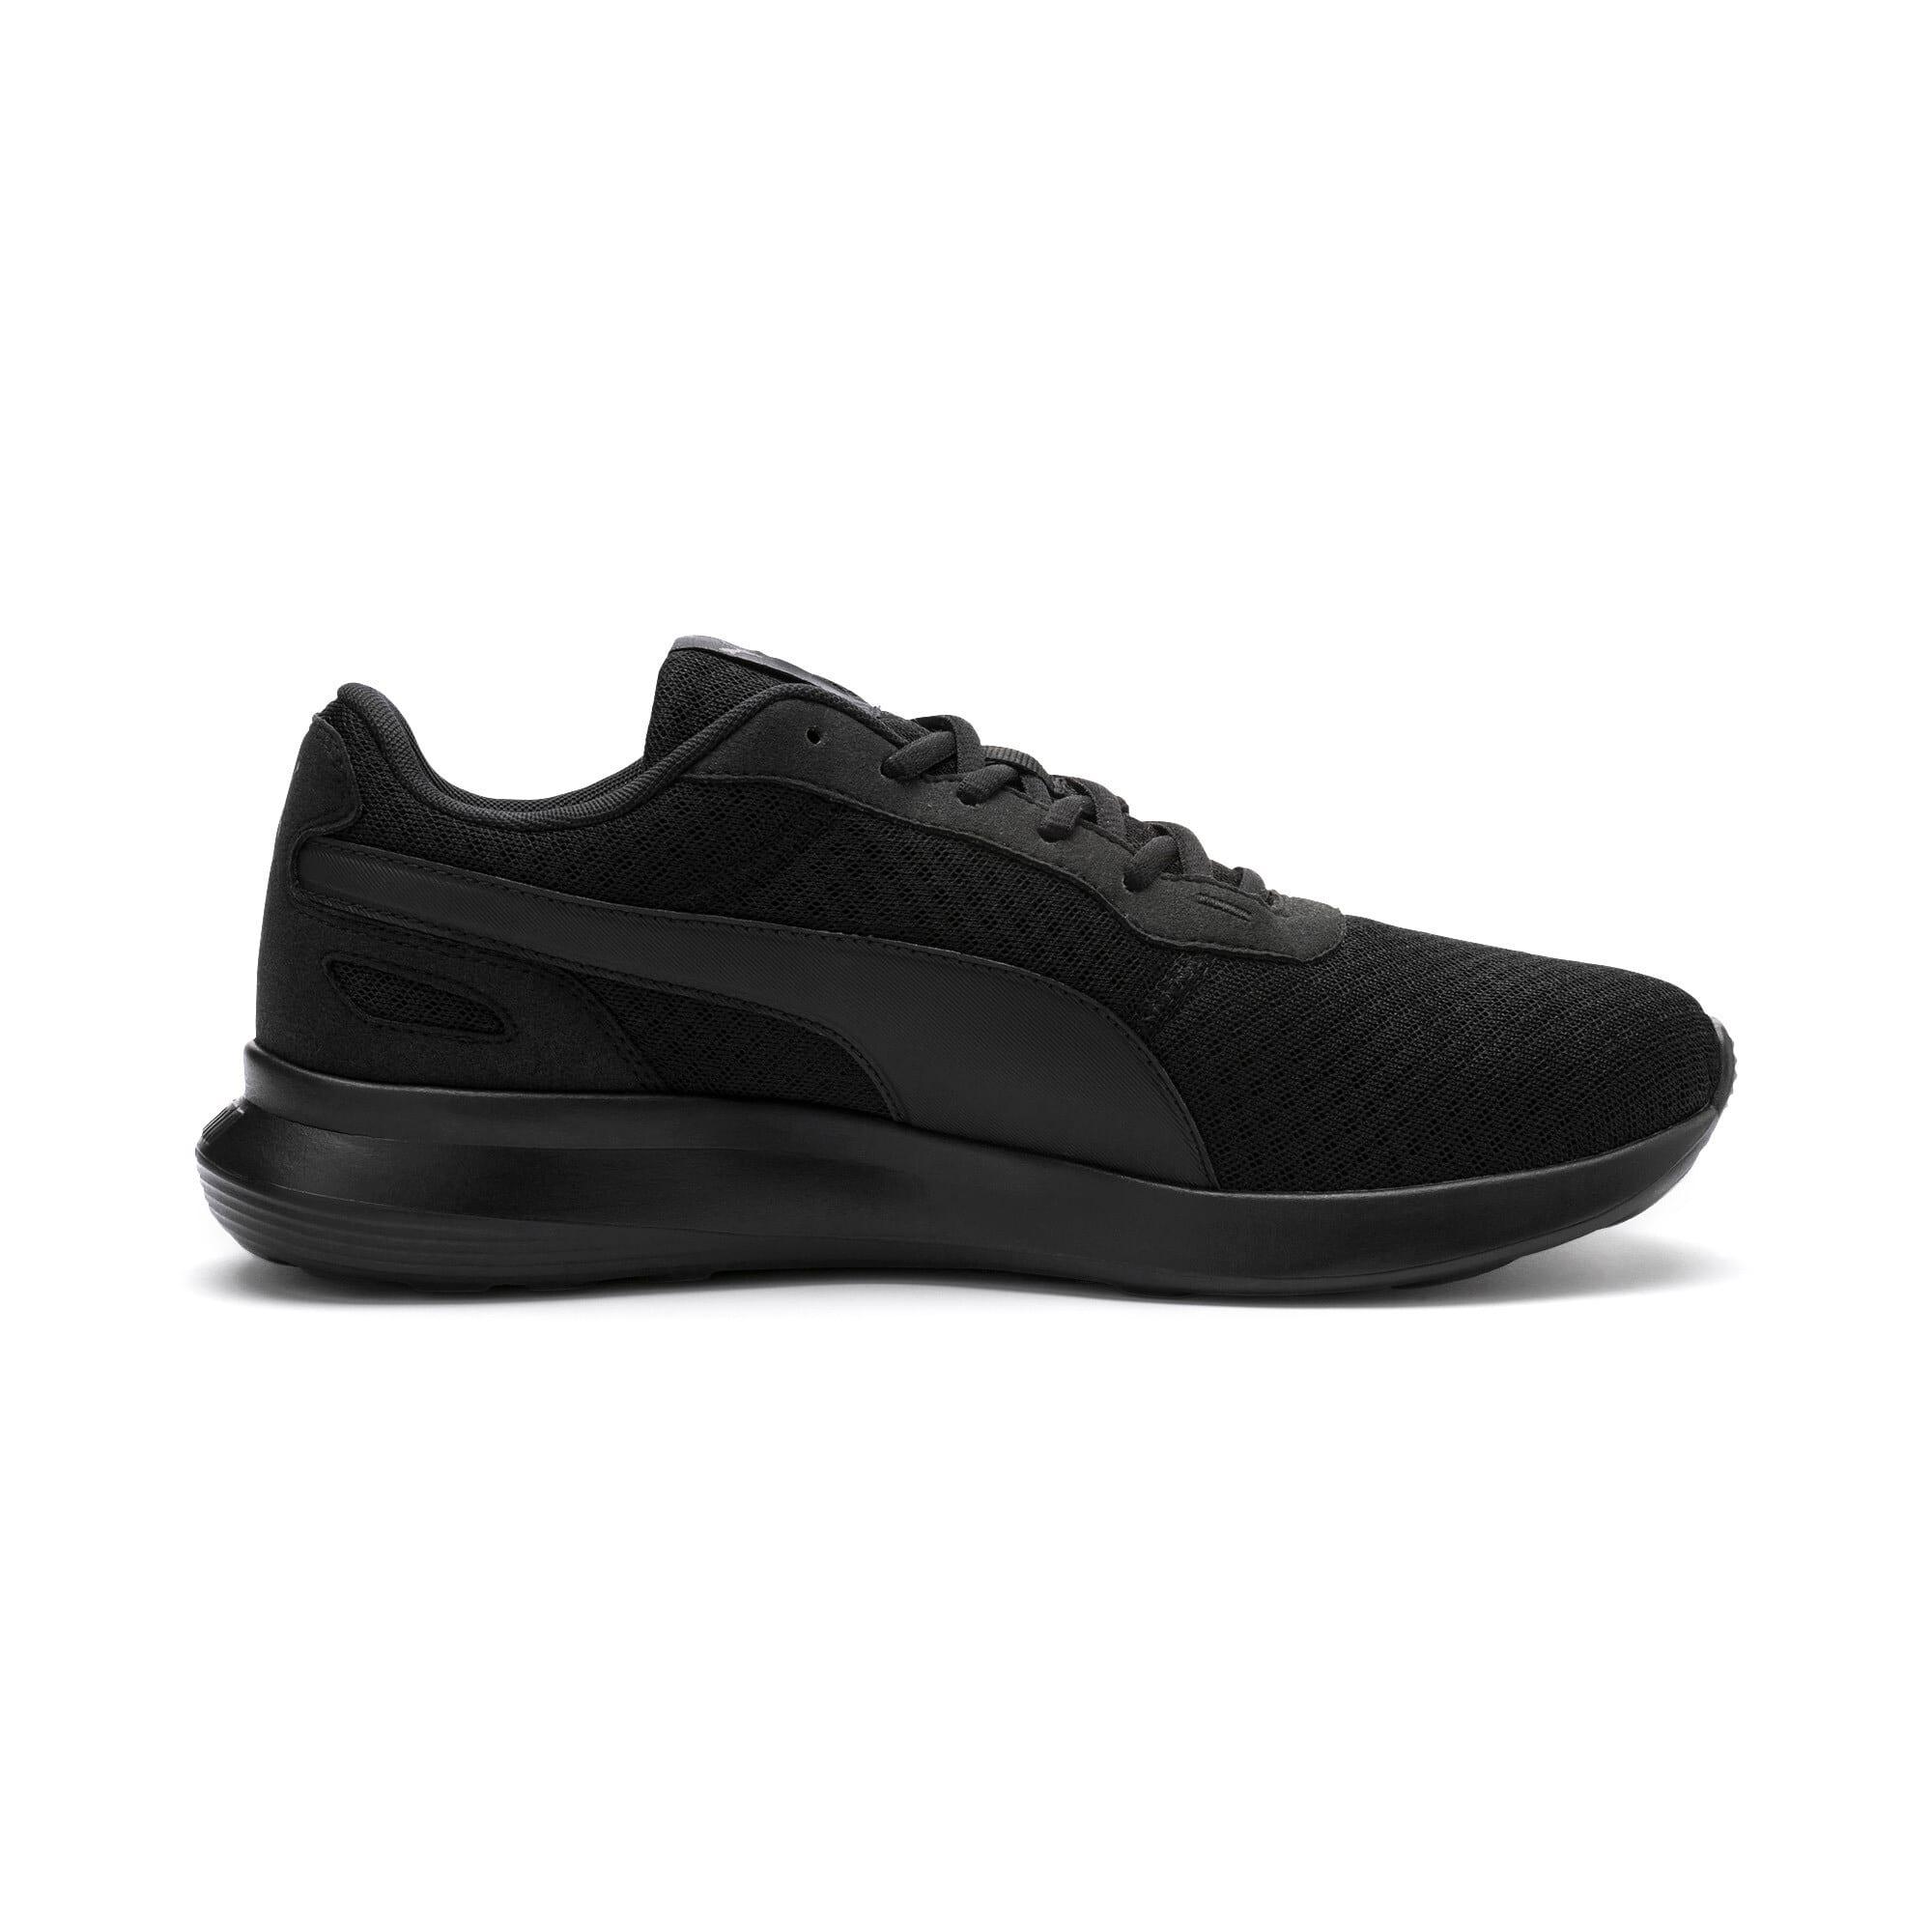 Thumbnail 5 of ST Activate Sneakers, Puma Black-Puma Black, medium